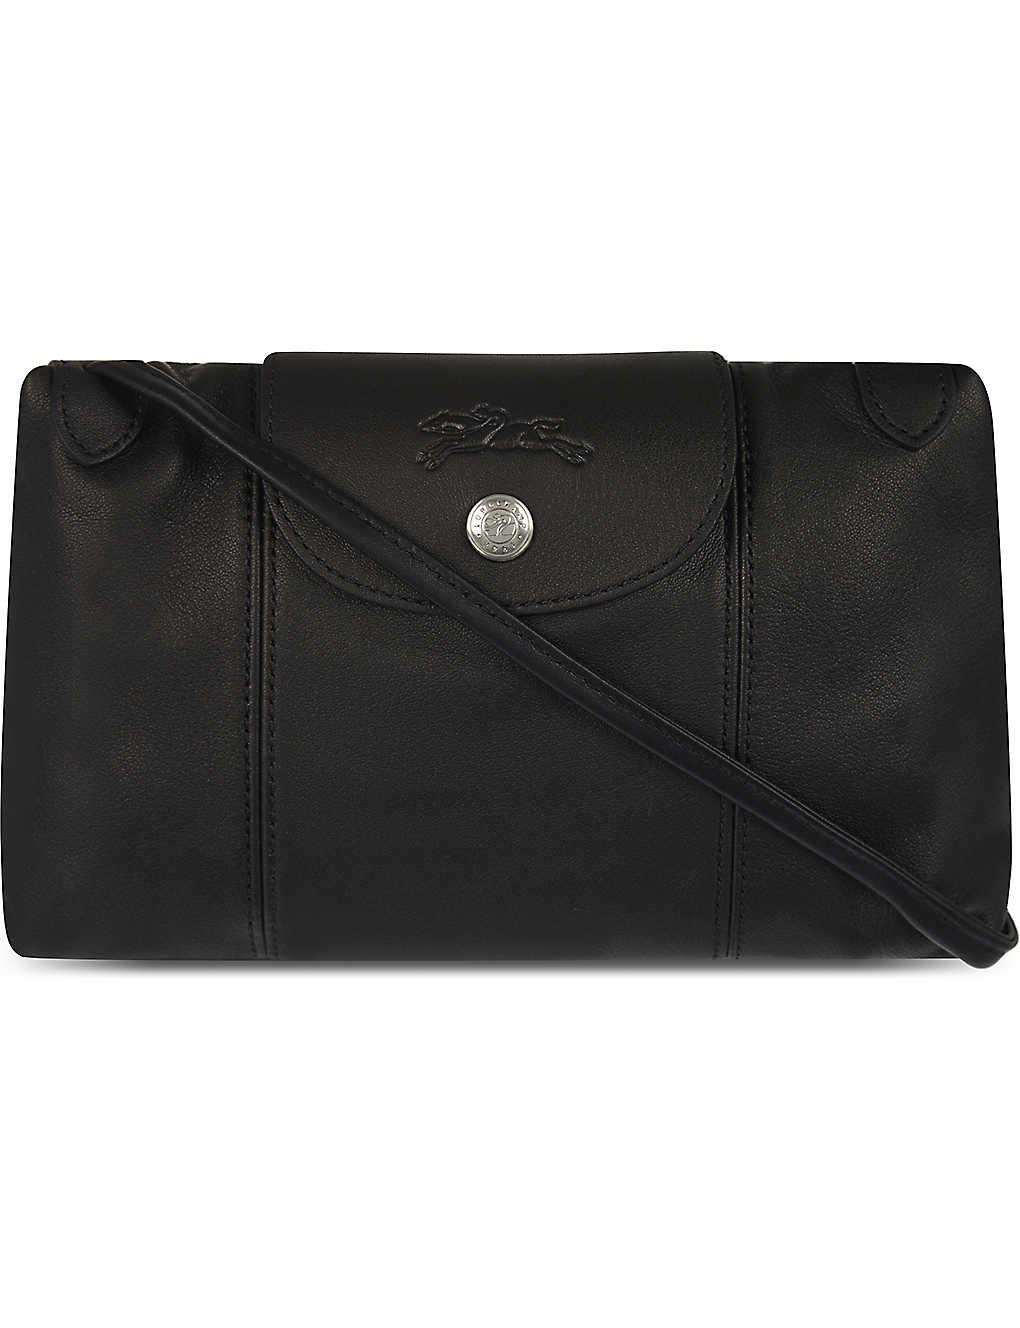 9ec4b35f5a9 LONGCHAMP - Le Pliage Cuir leather cross-body bag   Selfridges.com